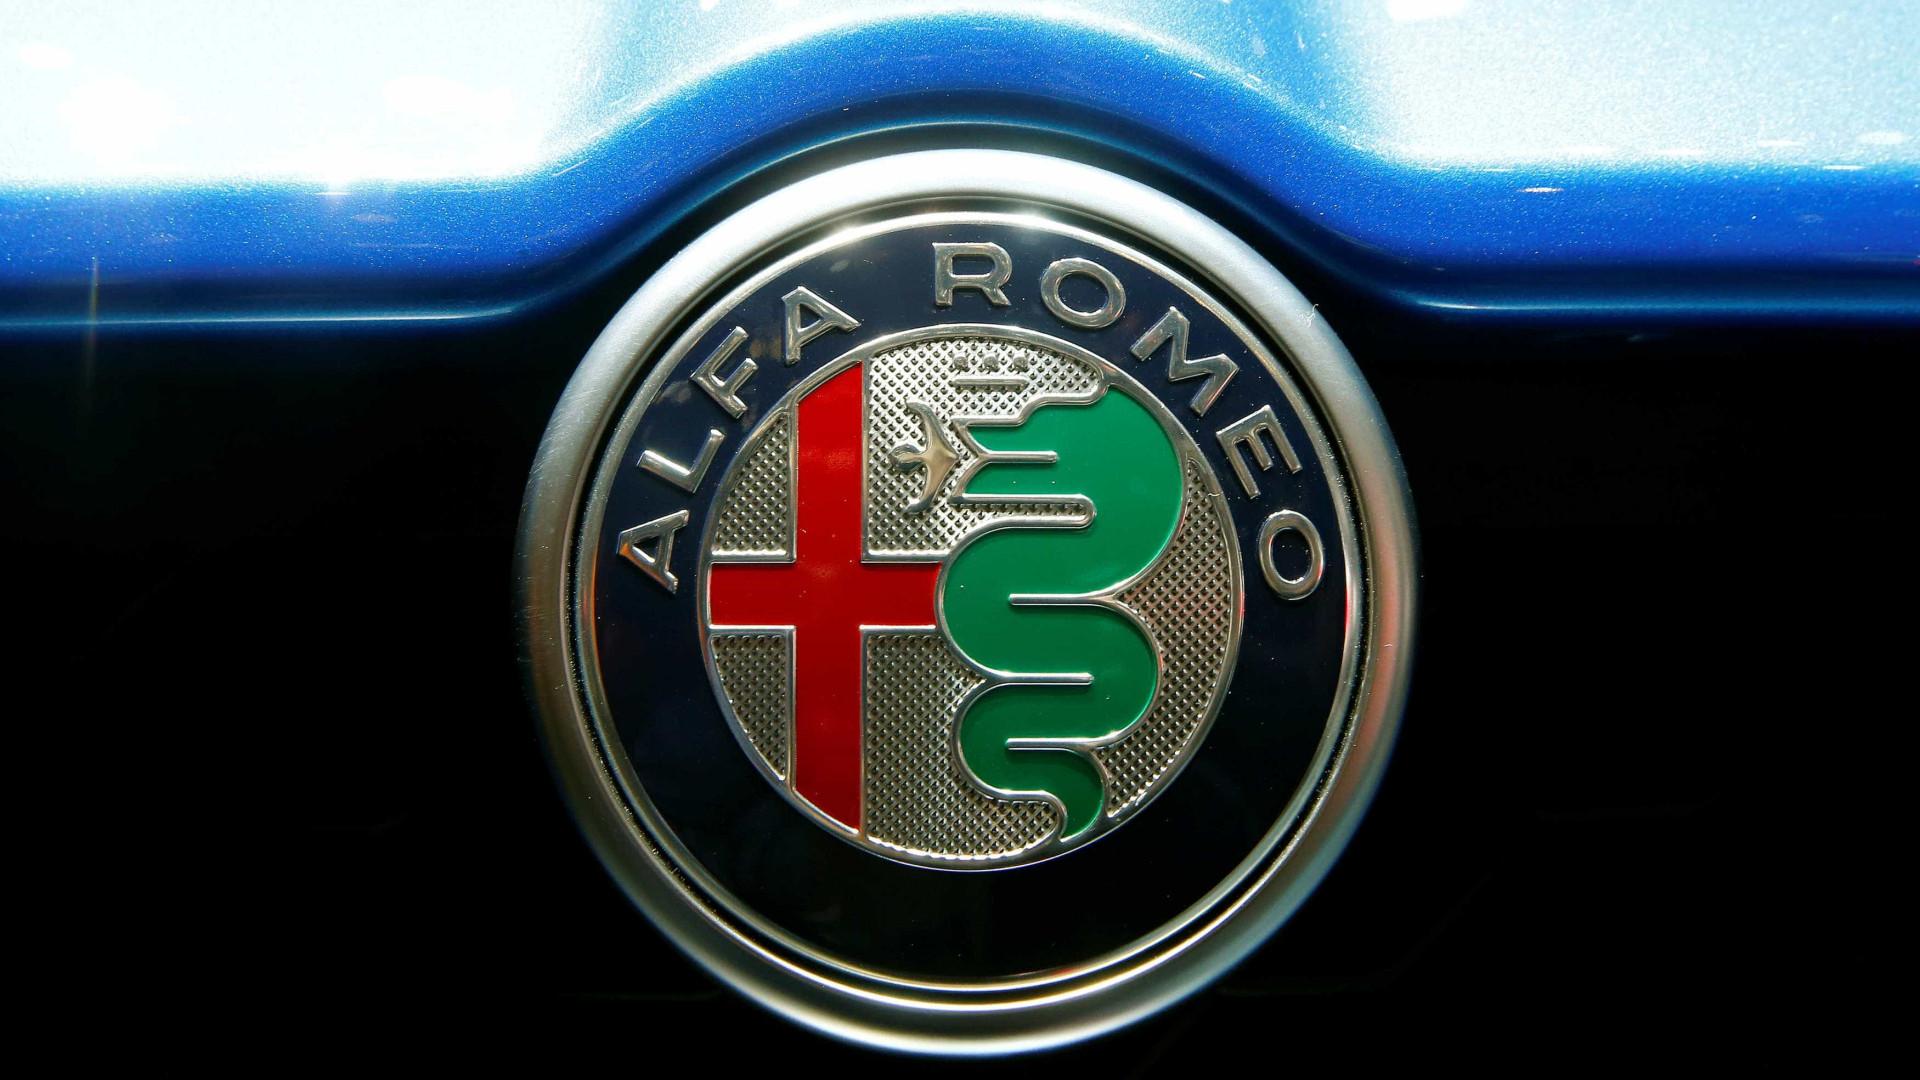 Alfa Romeo De Volta A F on alfa romeo dia, alfa romeo uk, alfa romeo ad, alfa romeo sc, alfa romeo info, alfa romeo ss, alfa romeo name, alfa romeo ac, alfa romeo ti, alfa romeo foto, alfa romeo duetto, alfa romeo gtz, alfa romeo sz, alfa romeo gt,